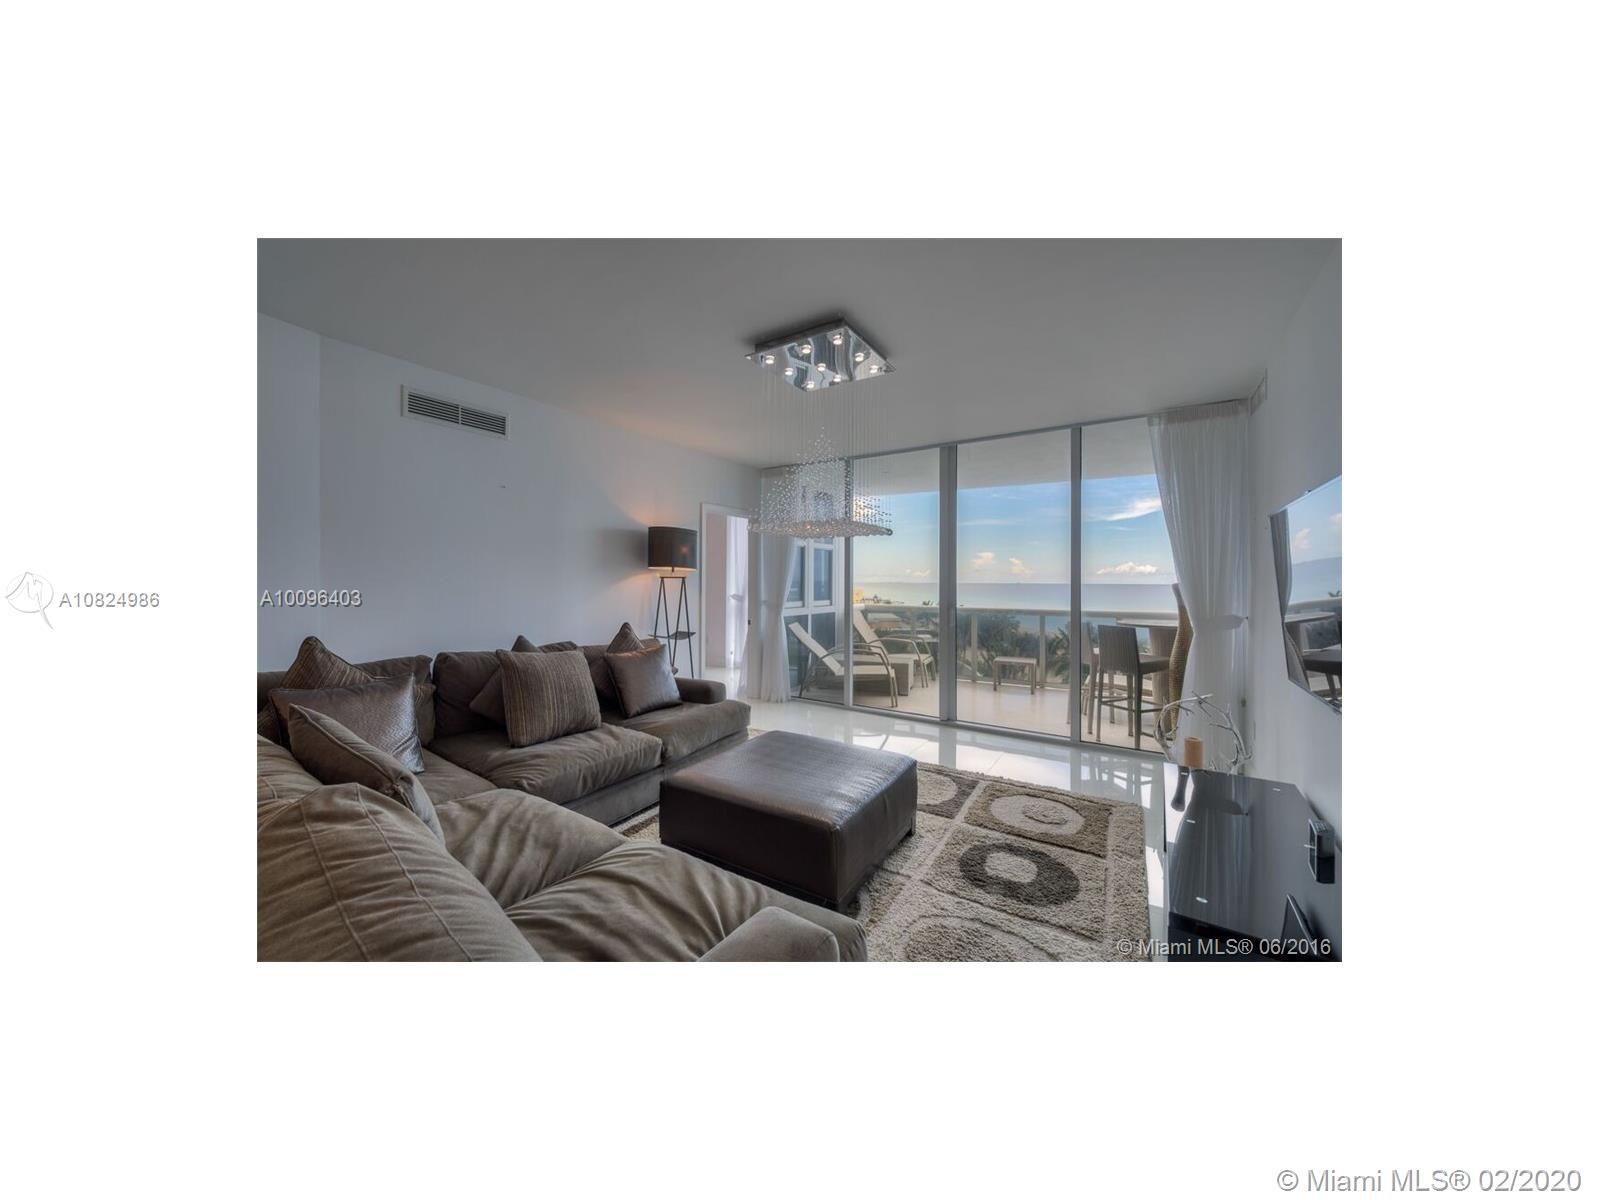 18201 Collins Ave Unit 706, Sunny Isles Beach FL 33160